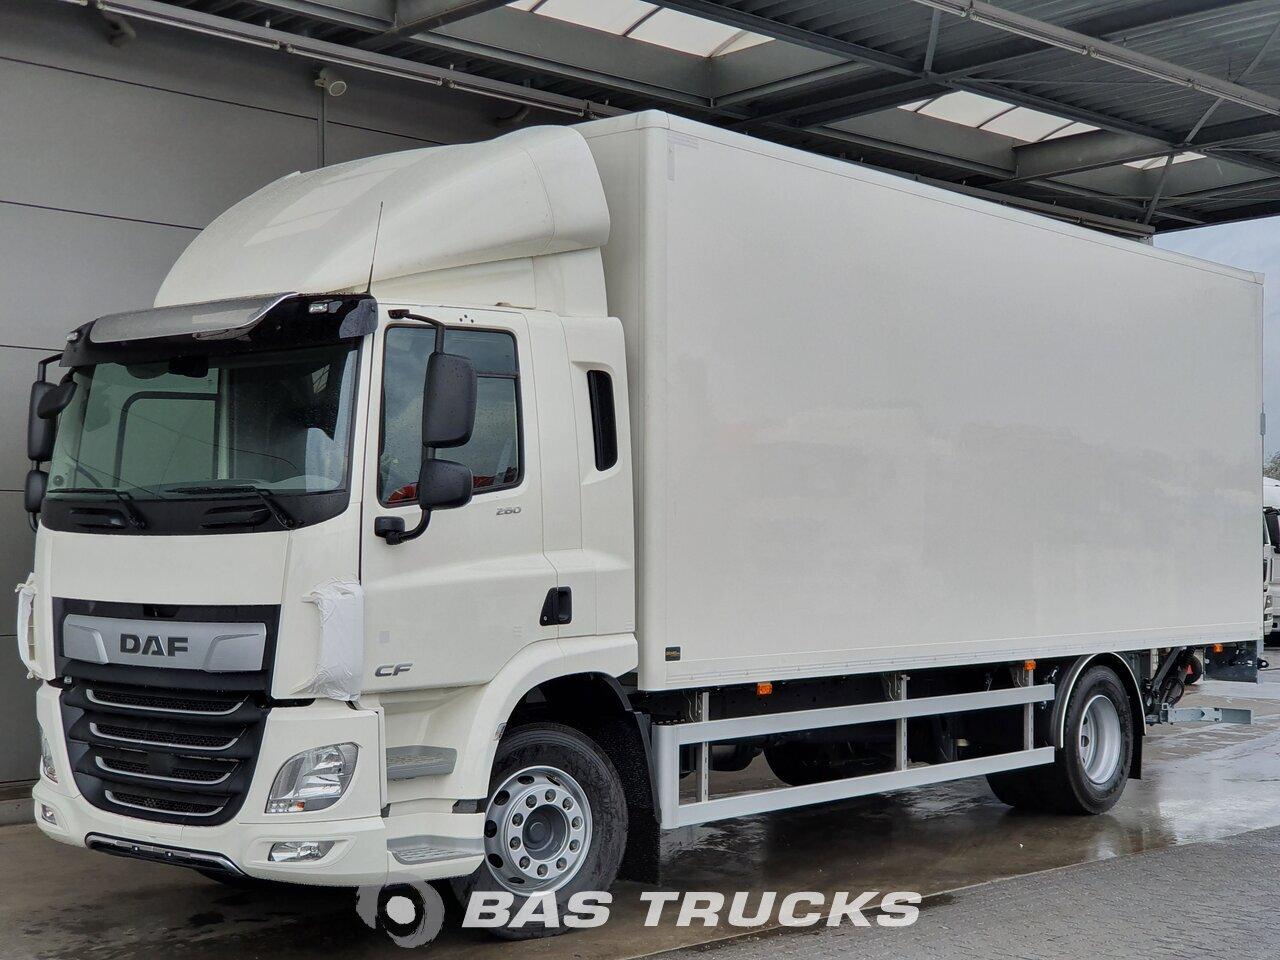 For sale at BAS Trucks: DAF CF 260 4X2 06/2019